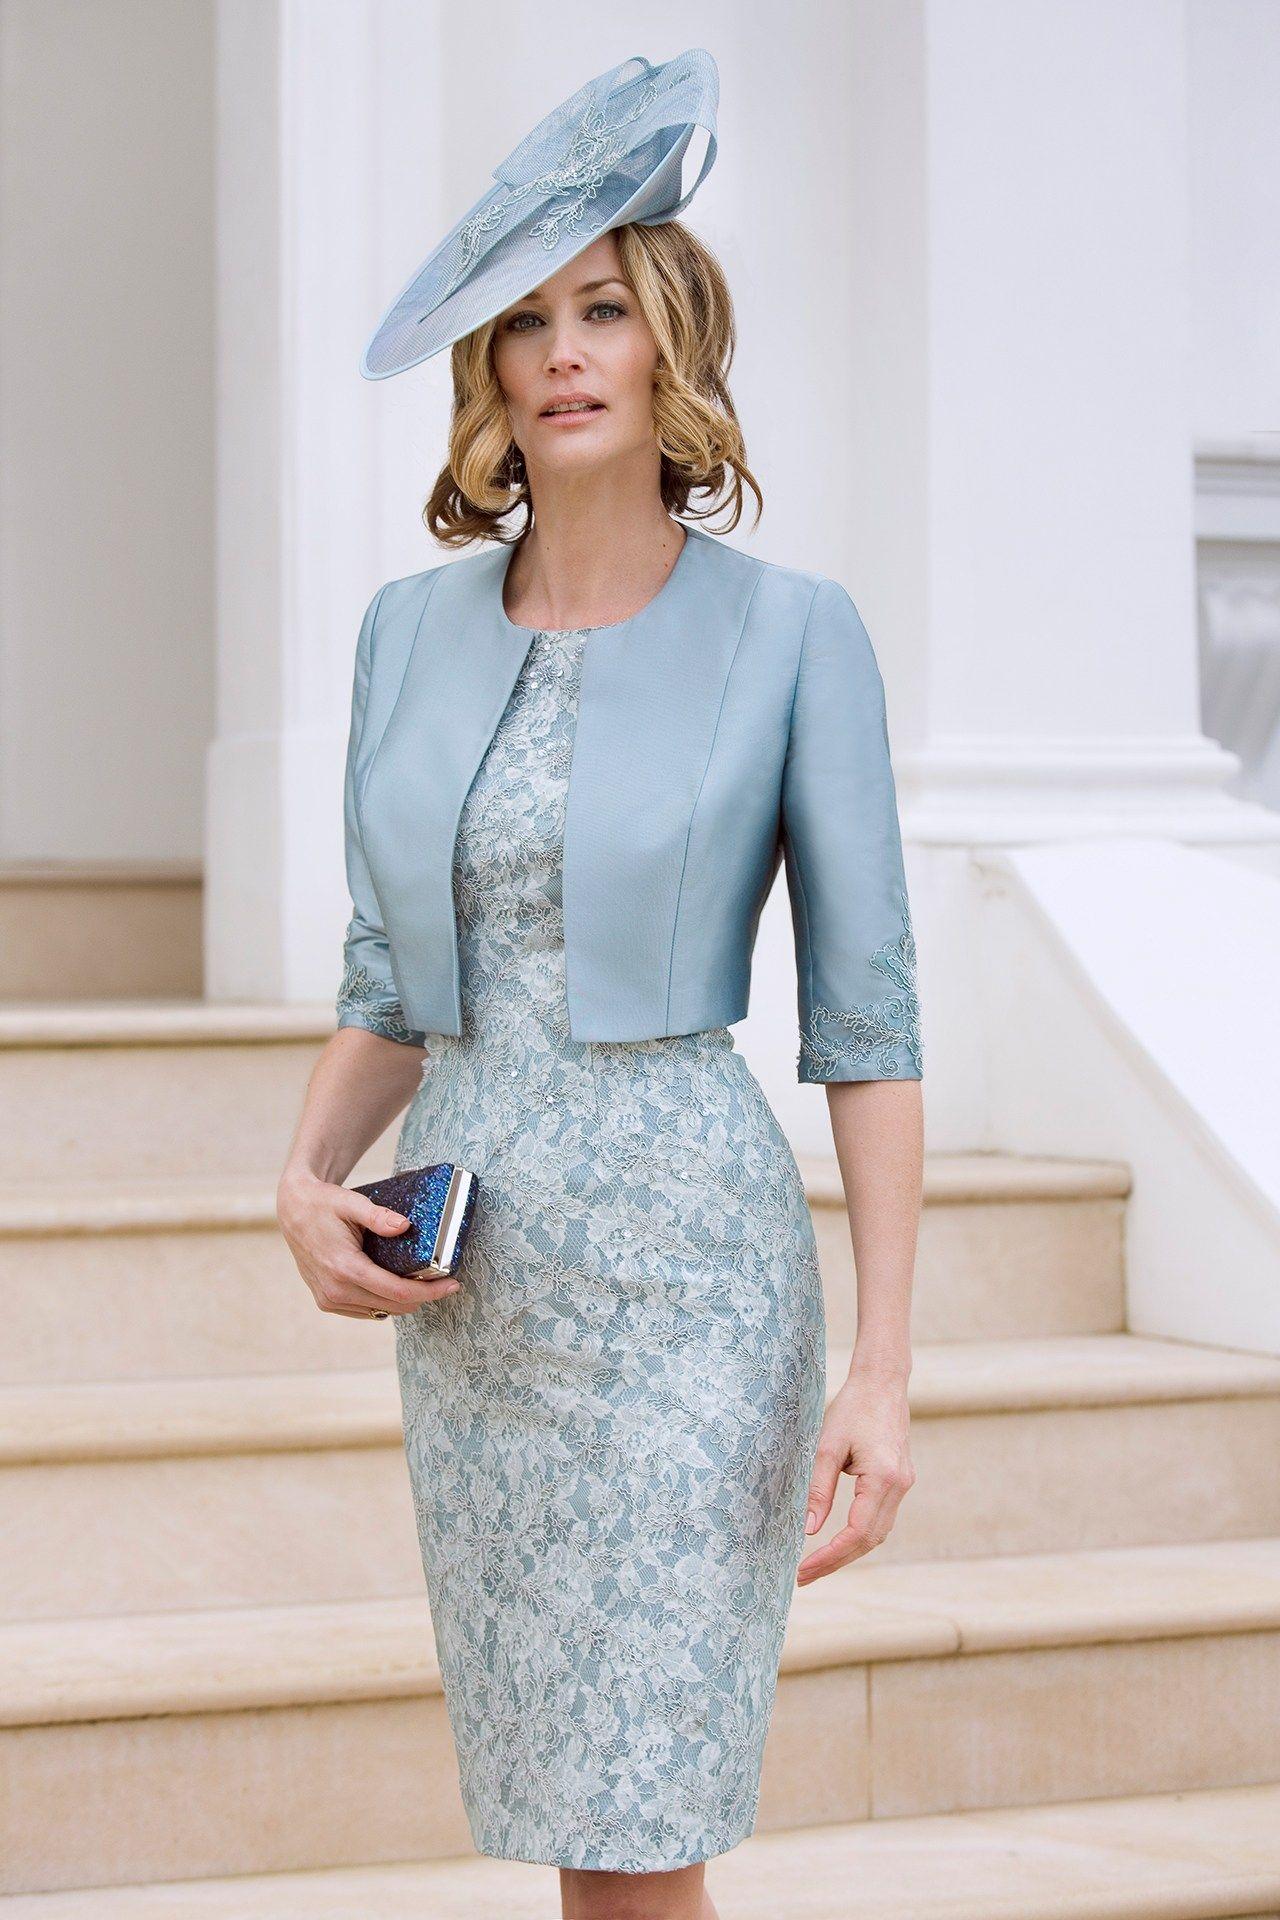 Light Sky Blue Mother of the Bride Dresses - QueenaBelle UK 2017